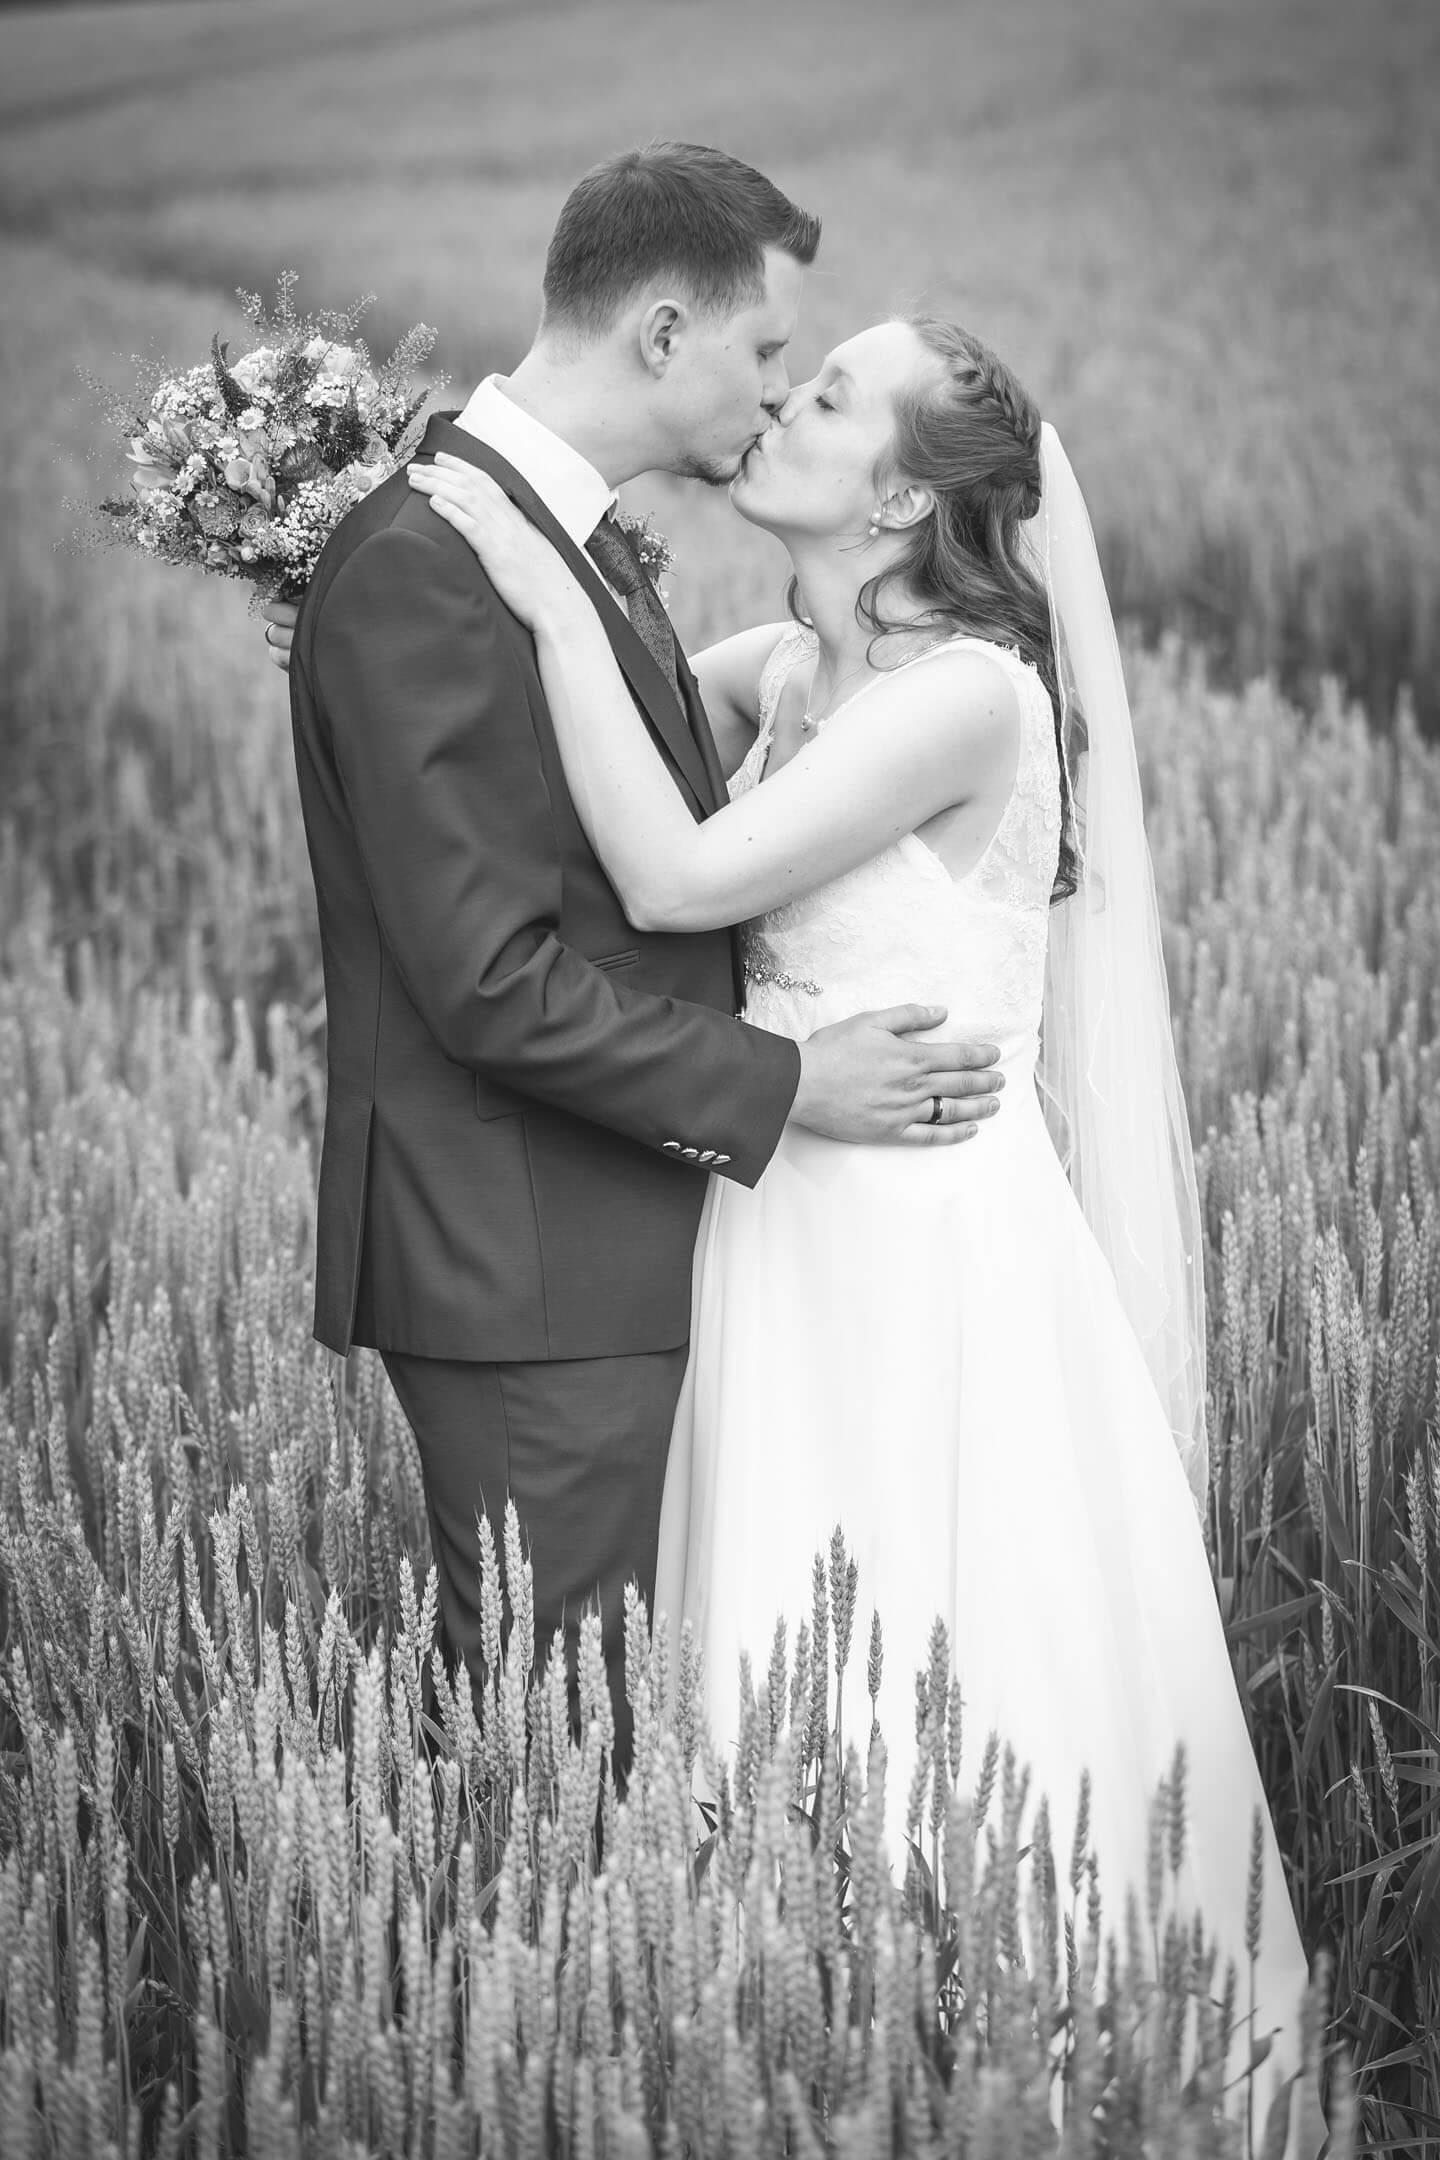 Hochzeitsfoto im Kornfeld